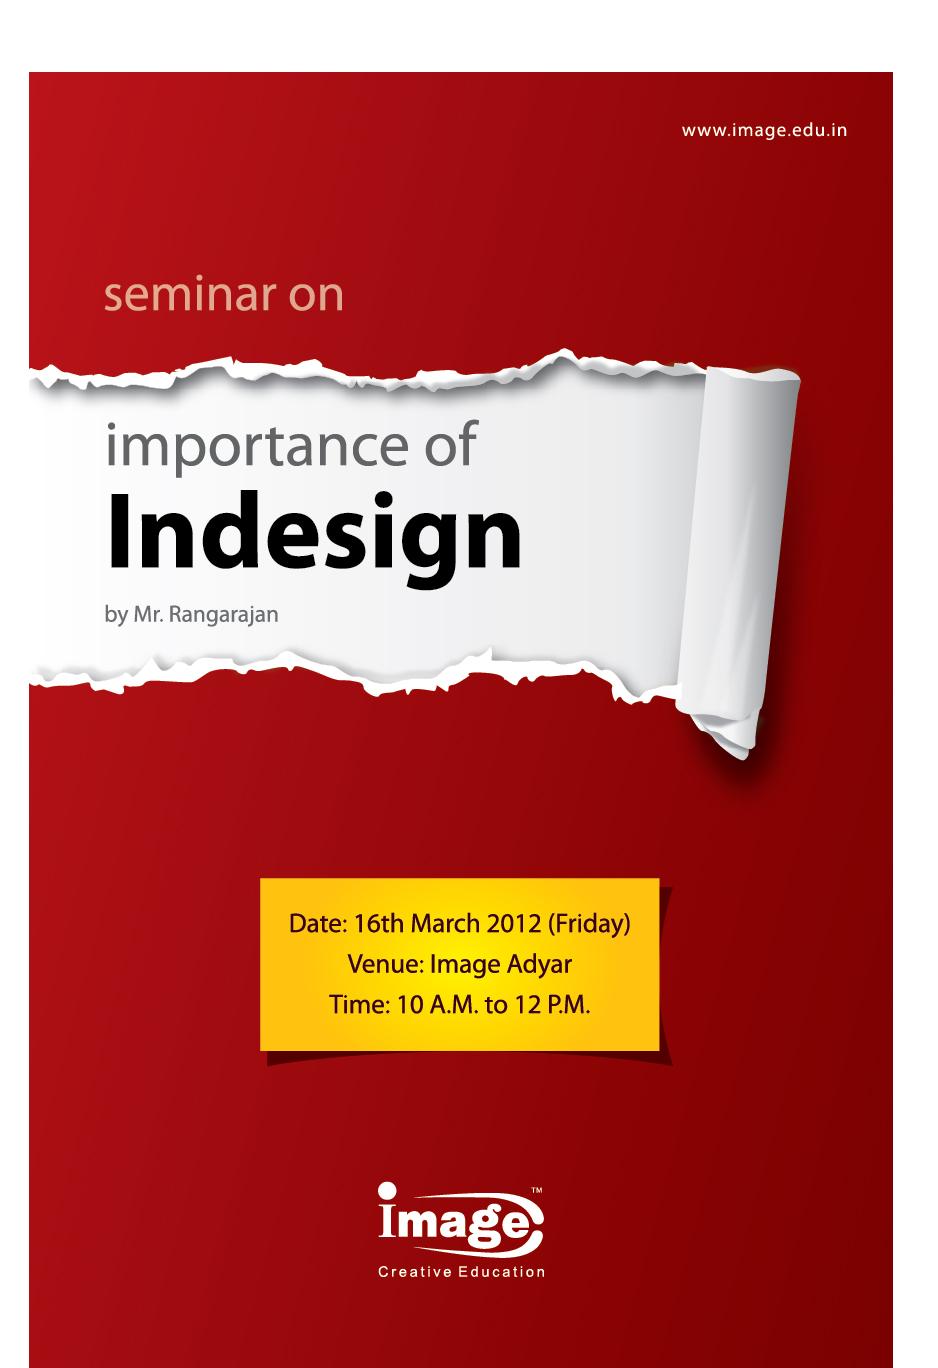 Poster design in indesign - Download